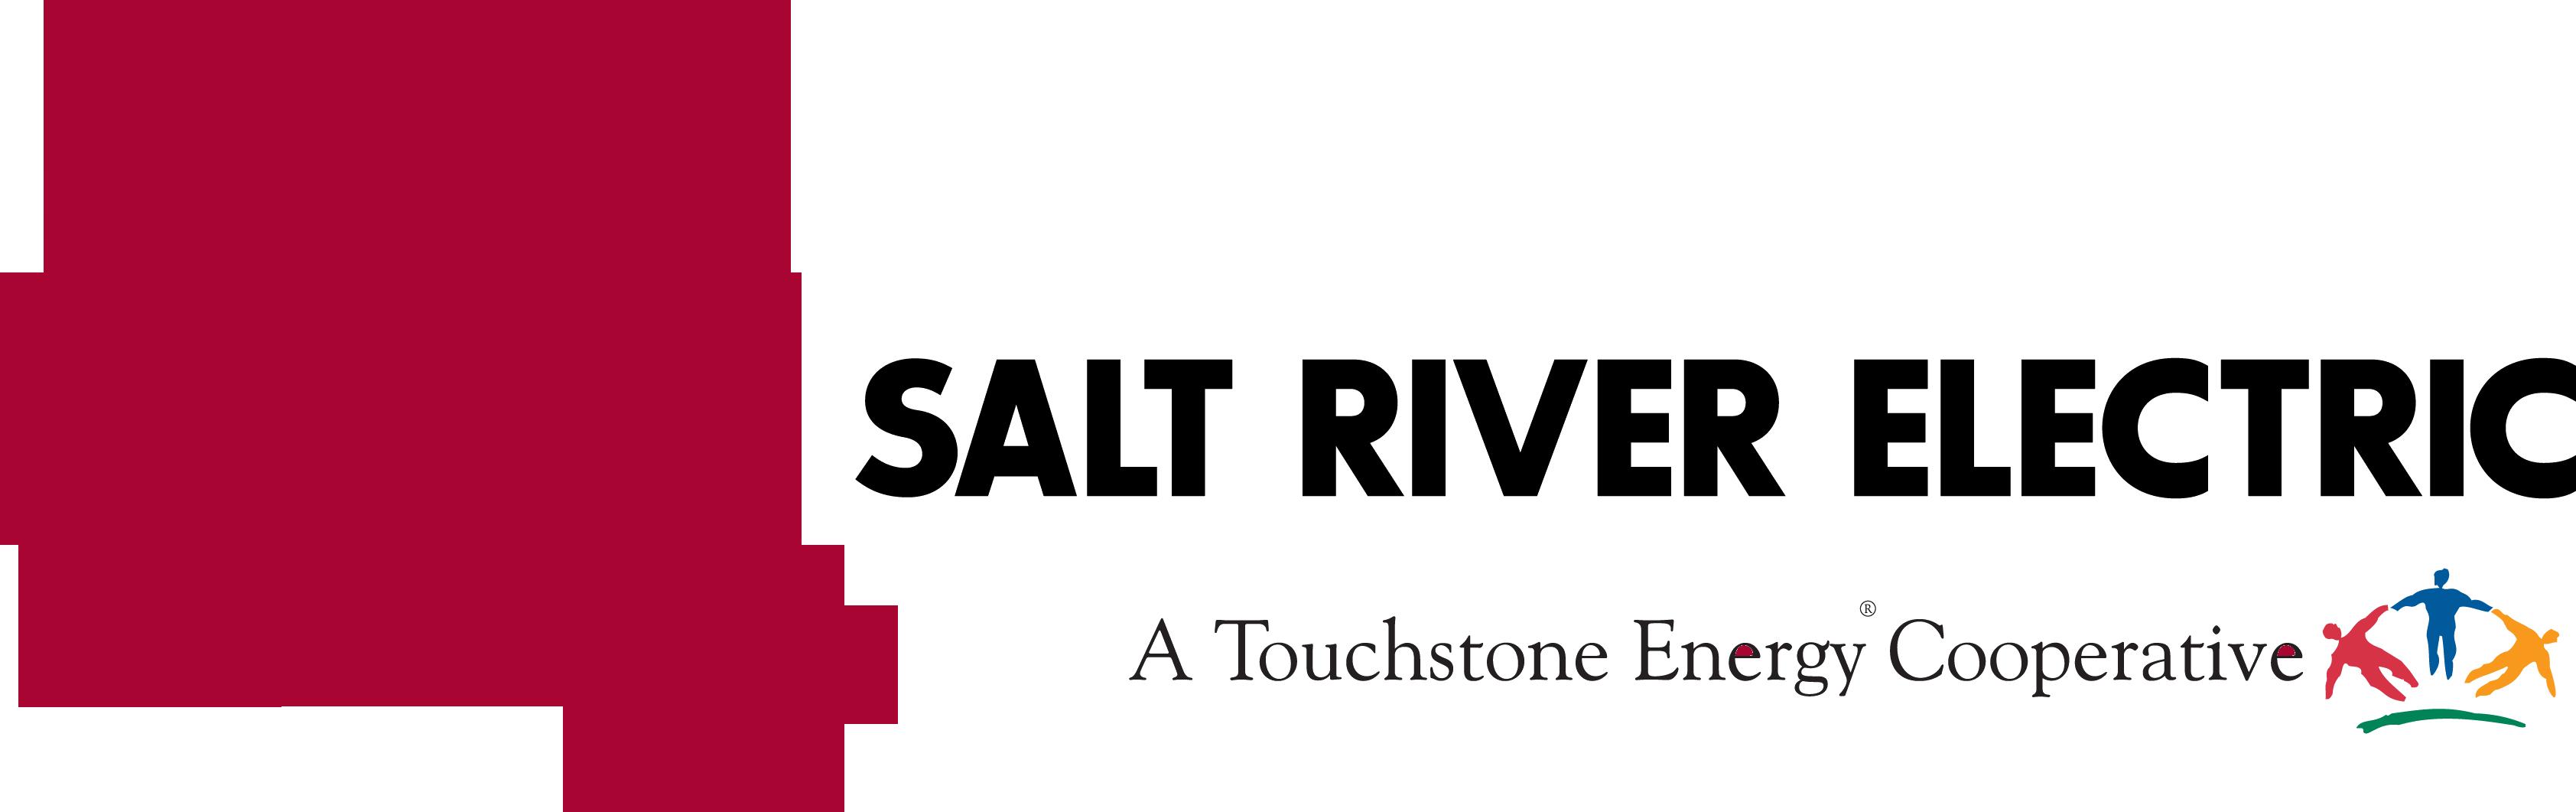 Salt River Electric